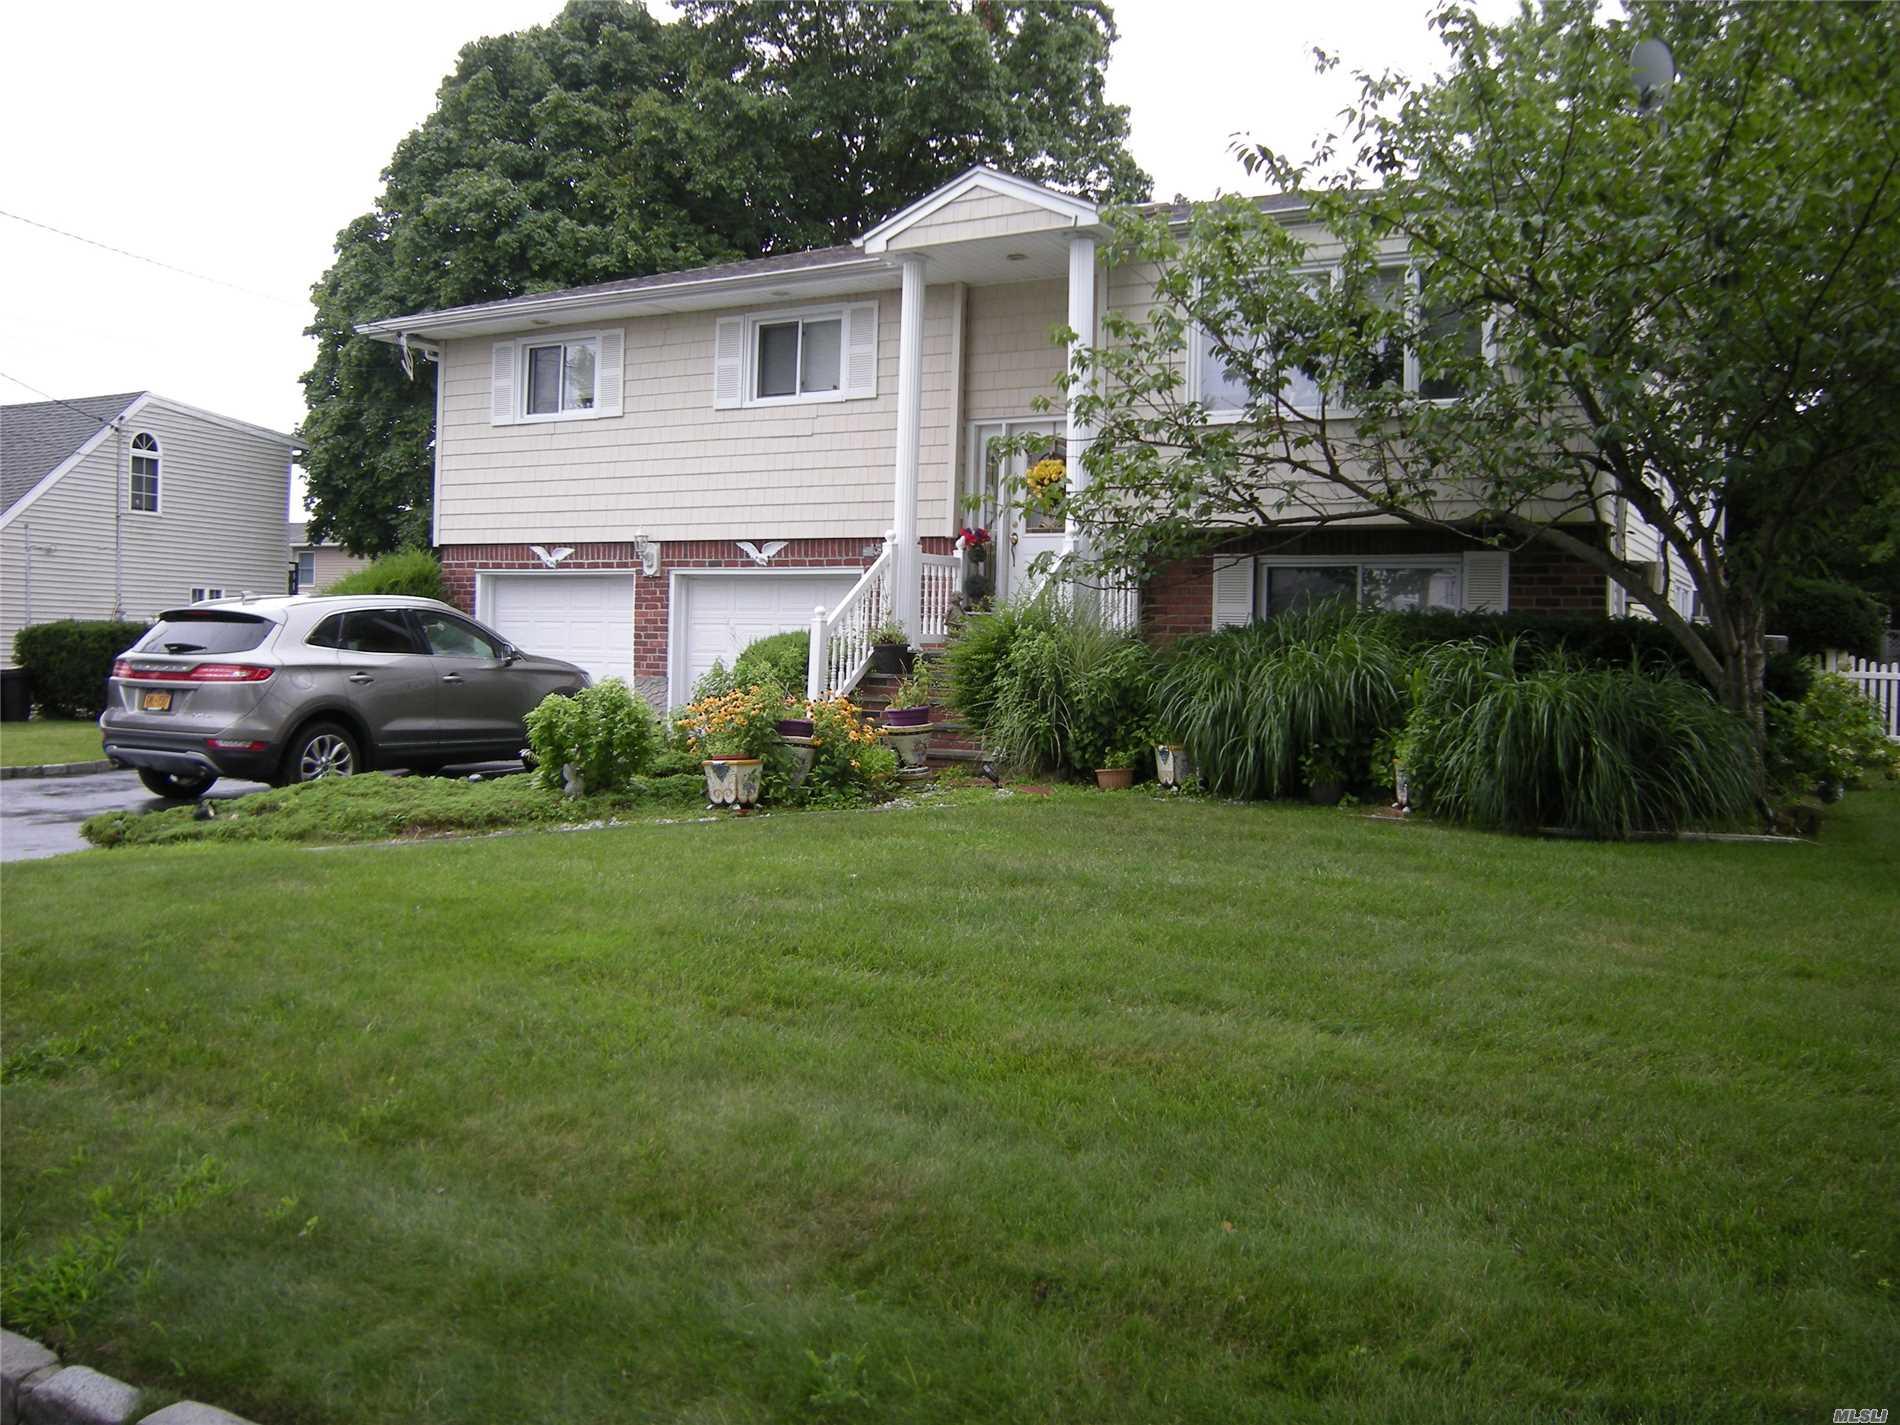 Photo of home for sale at 215 Biltmore Blvd, Massapequa NY